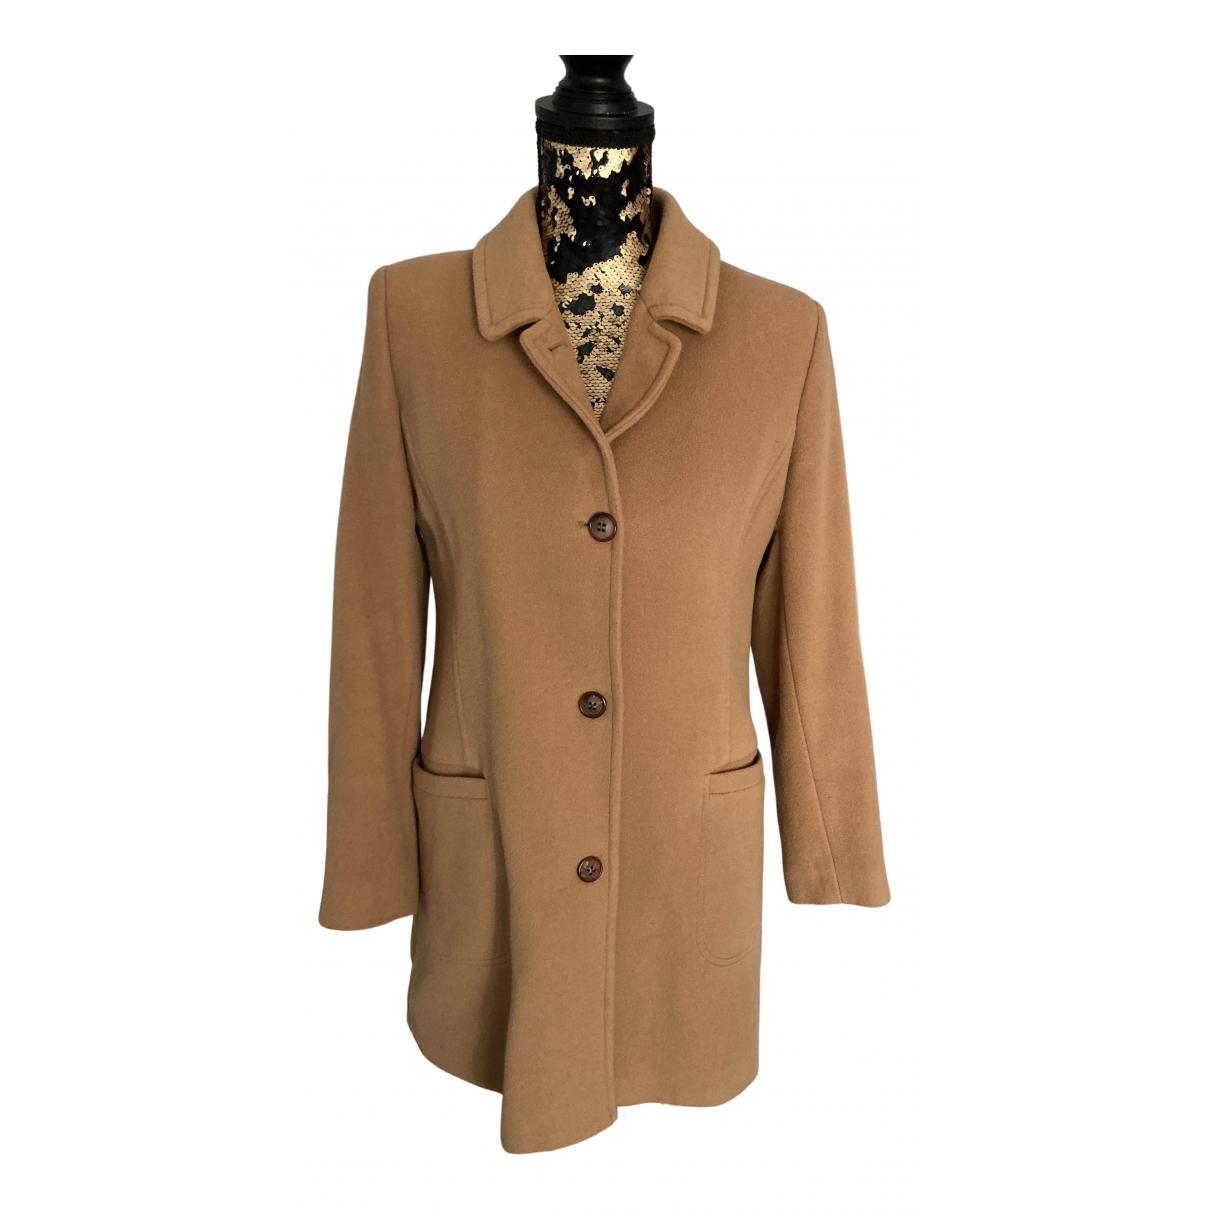 Burberry \N Beige Wool coat for Women M International